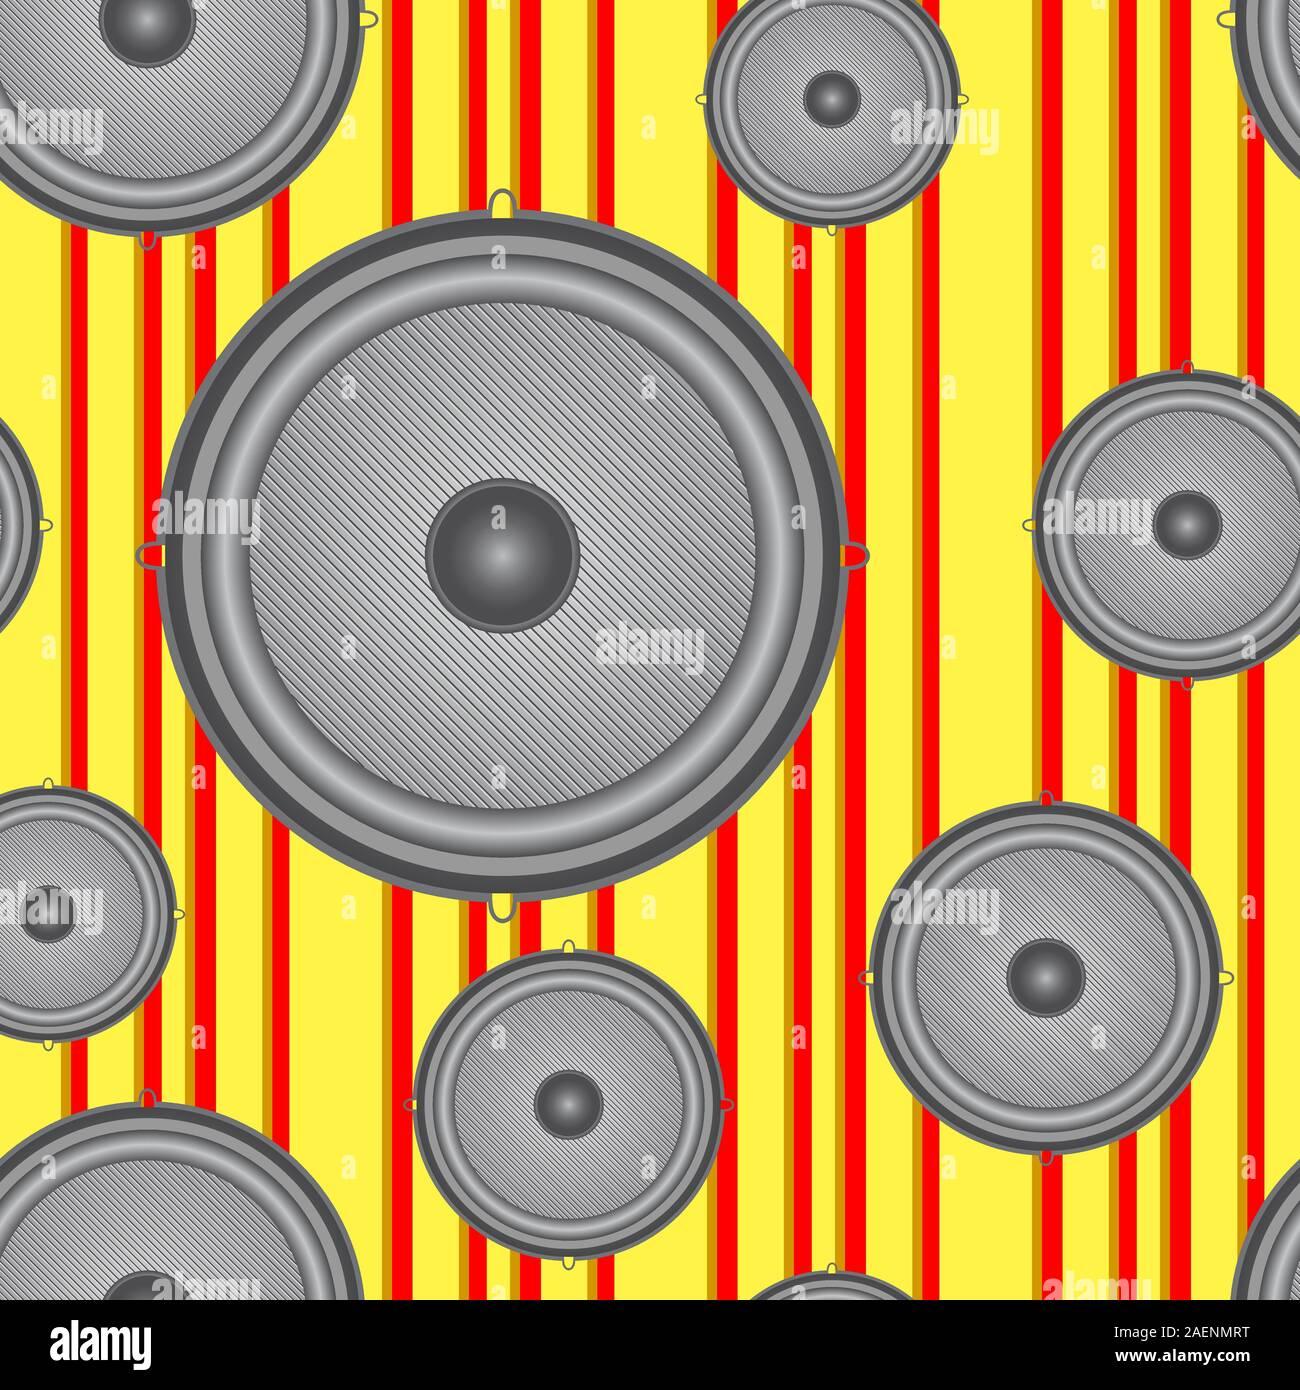 Speakers seamless background. Vector illustration. Stock Vector